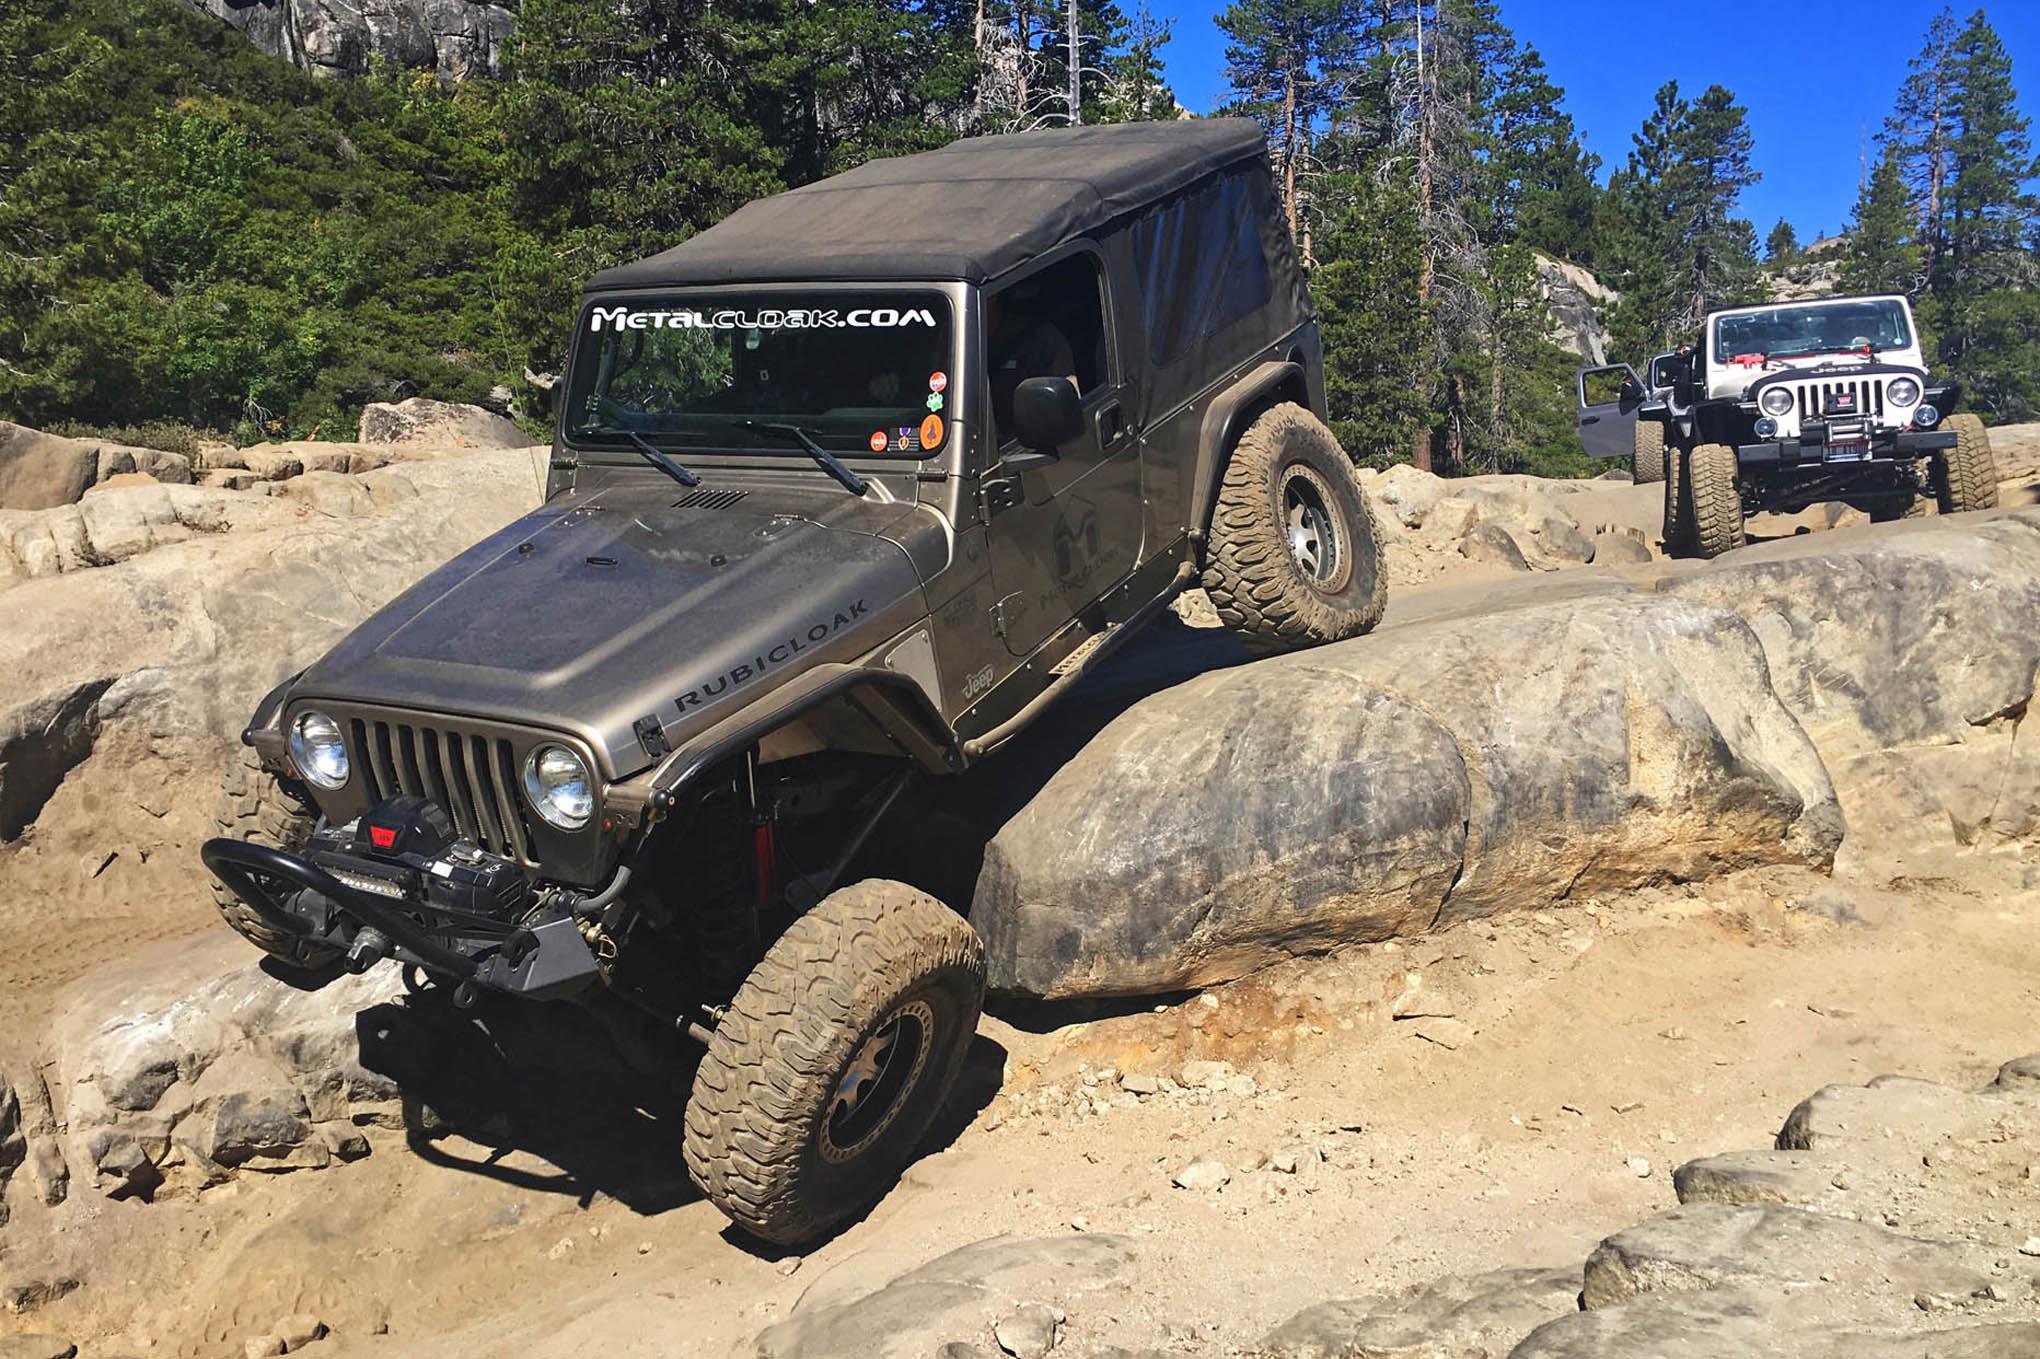 066 rubicon trail modern jeeper adventures metal cloak 2019 stuart bourdon